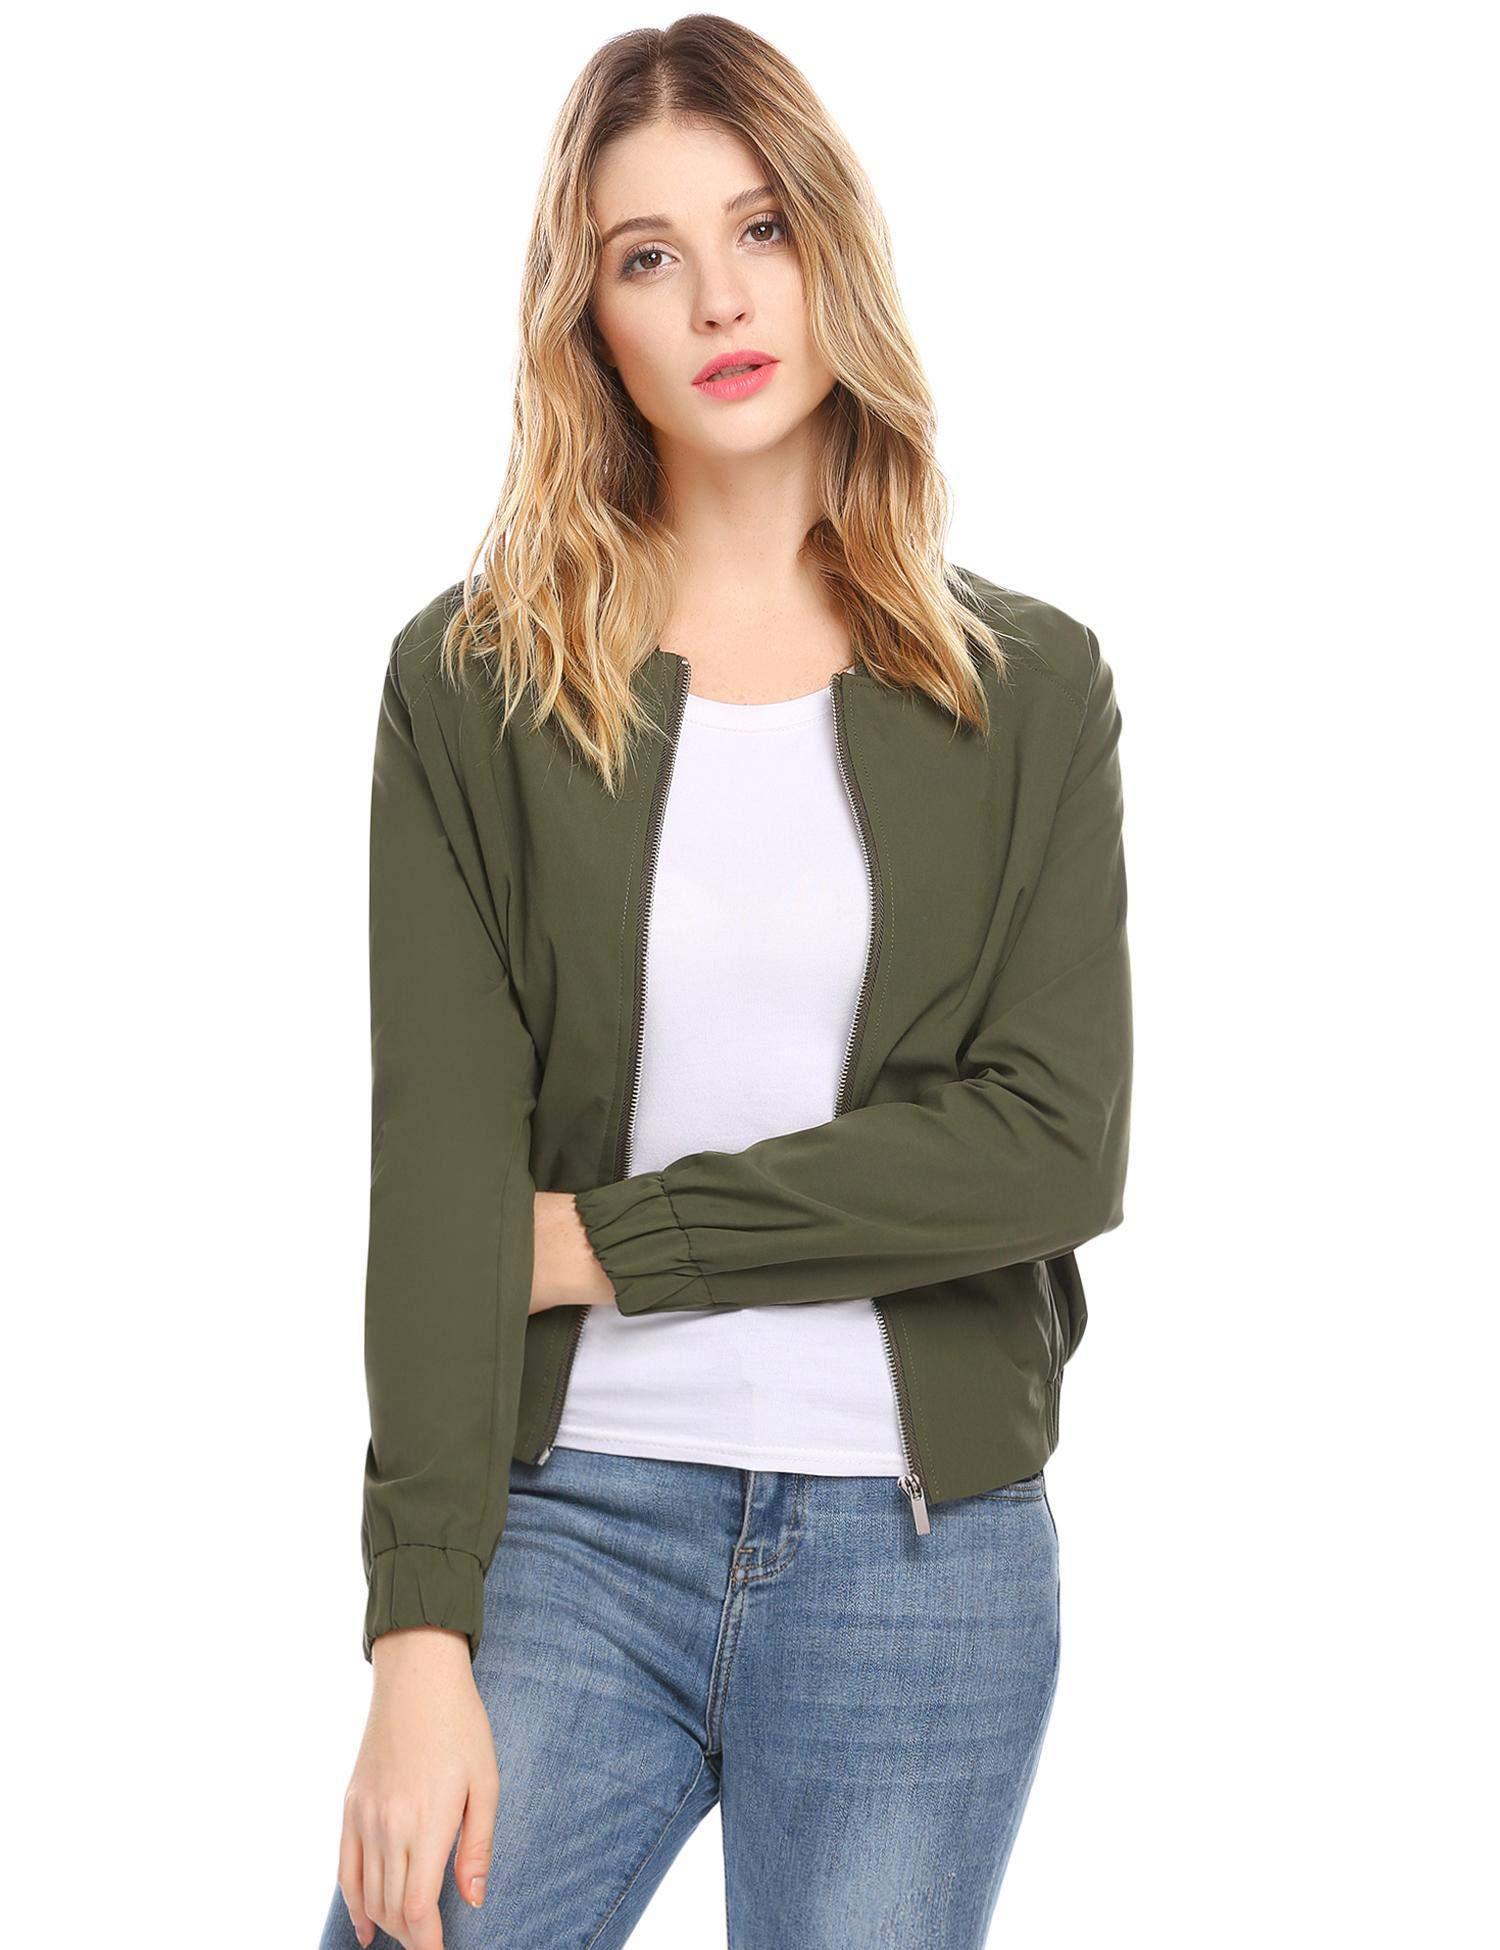 Zeagoo Womens Fashion Casual Collarless Long Sleeve Windbreaker Lightweight Zip Up Jacket Coat